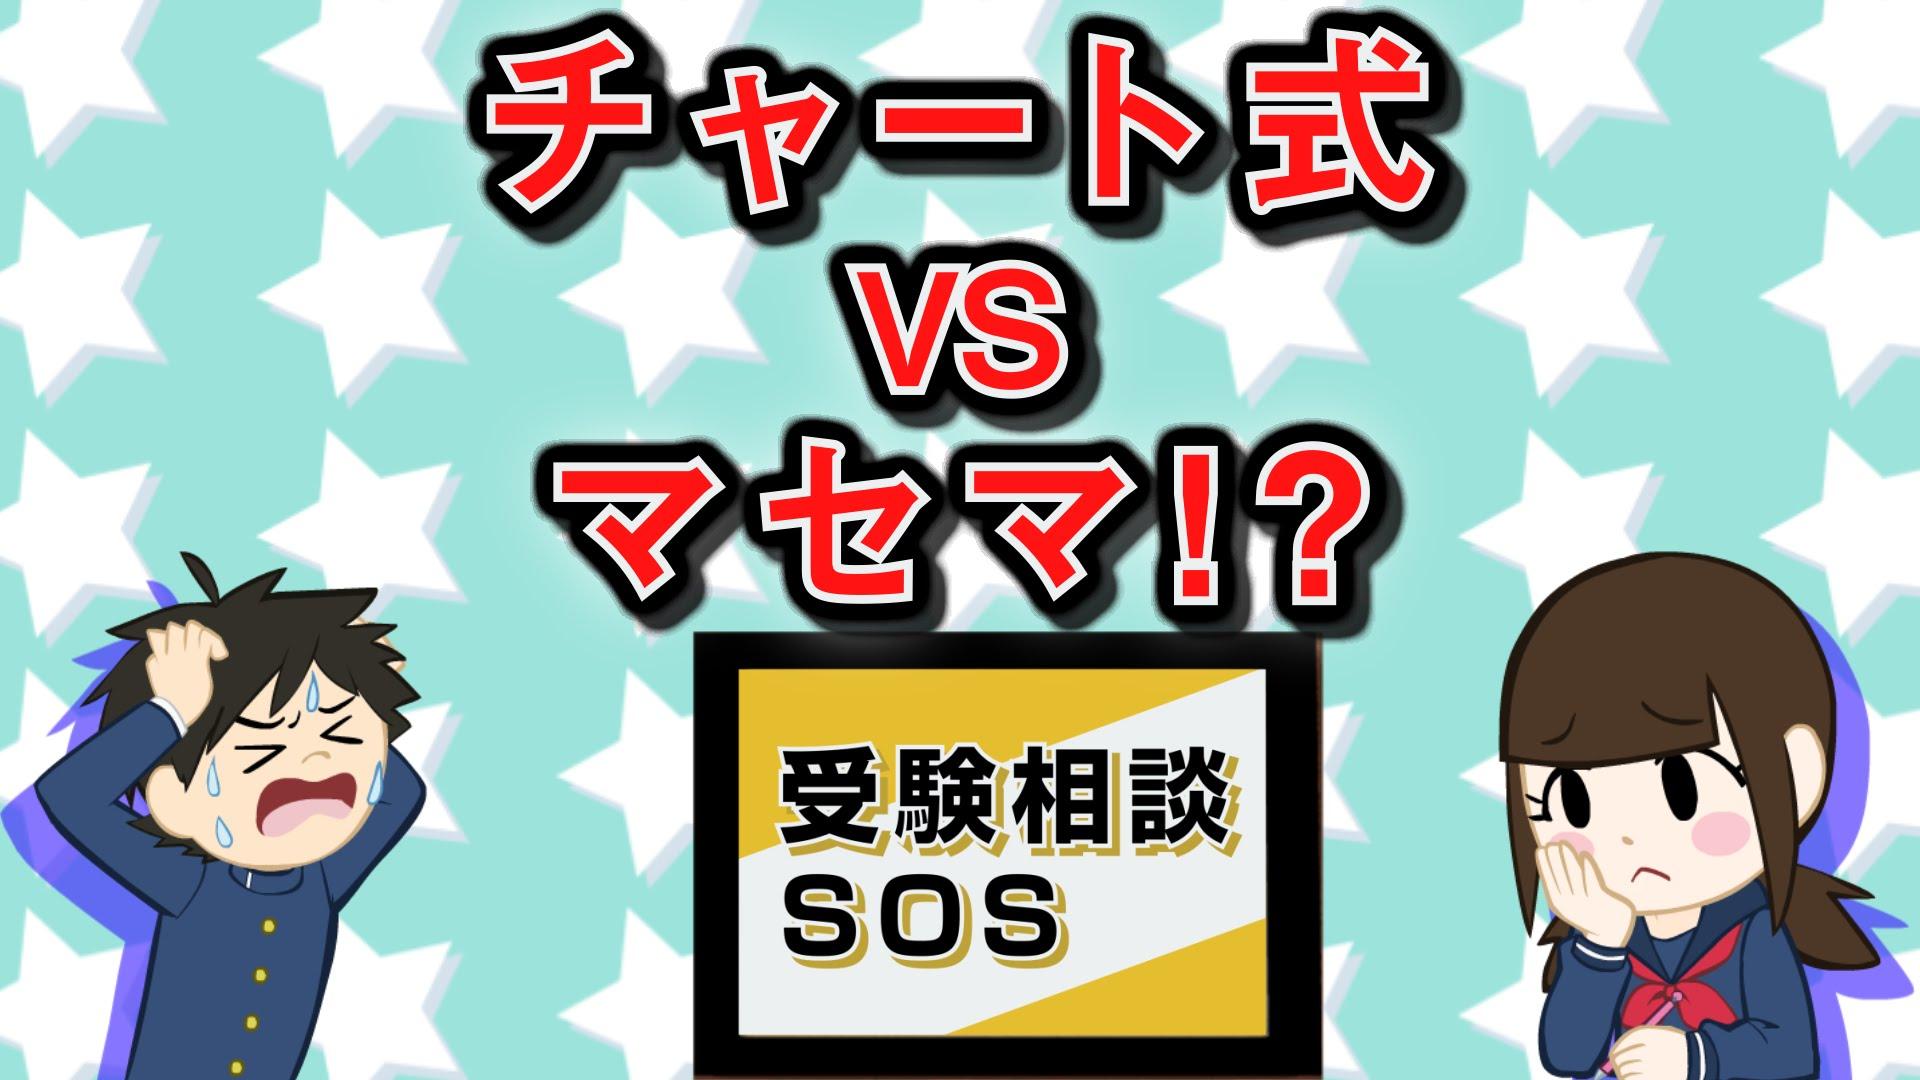 【vol.26】チャート式(網羅性)vsマセマ(わかりやすさ)!?|受験相談SOS